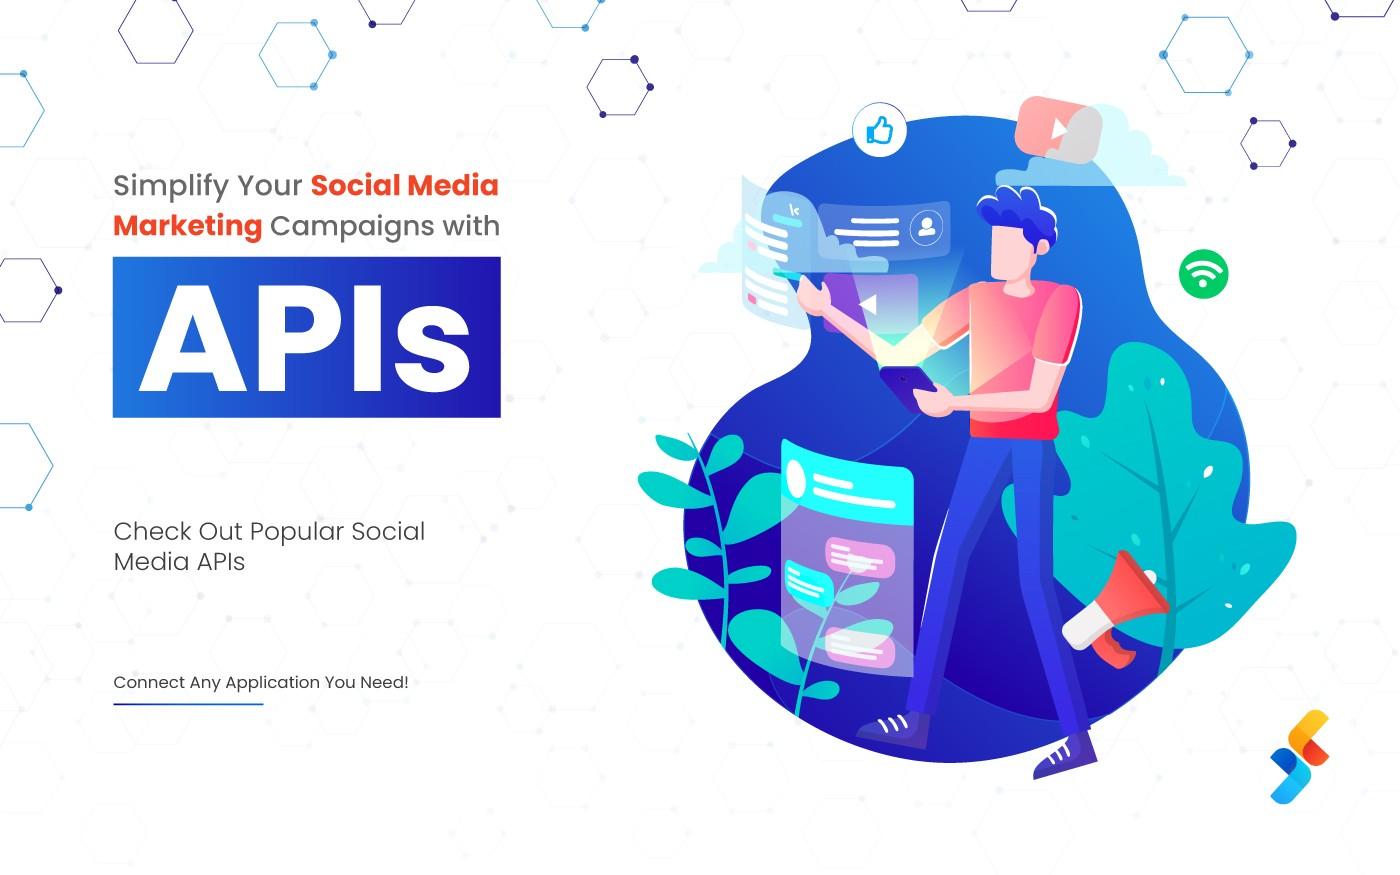 Importance of APIs